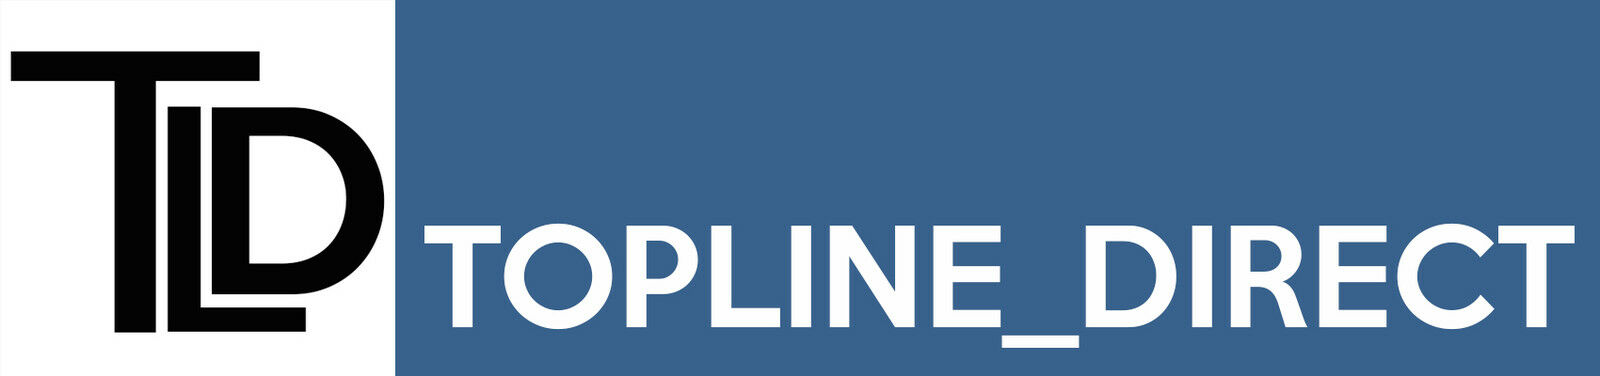 TOPLINE_DIRECT